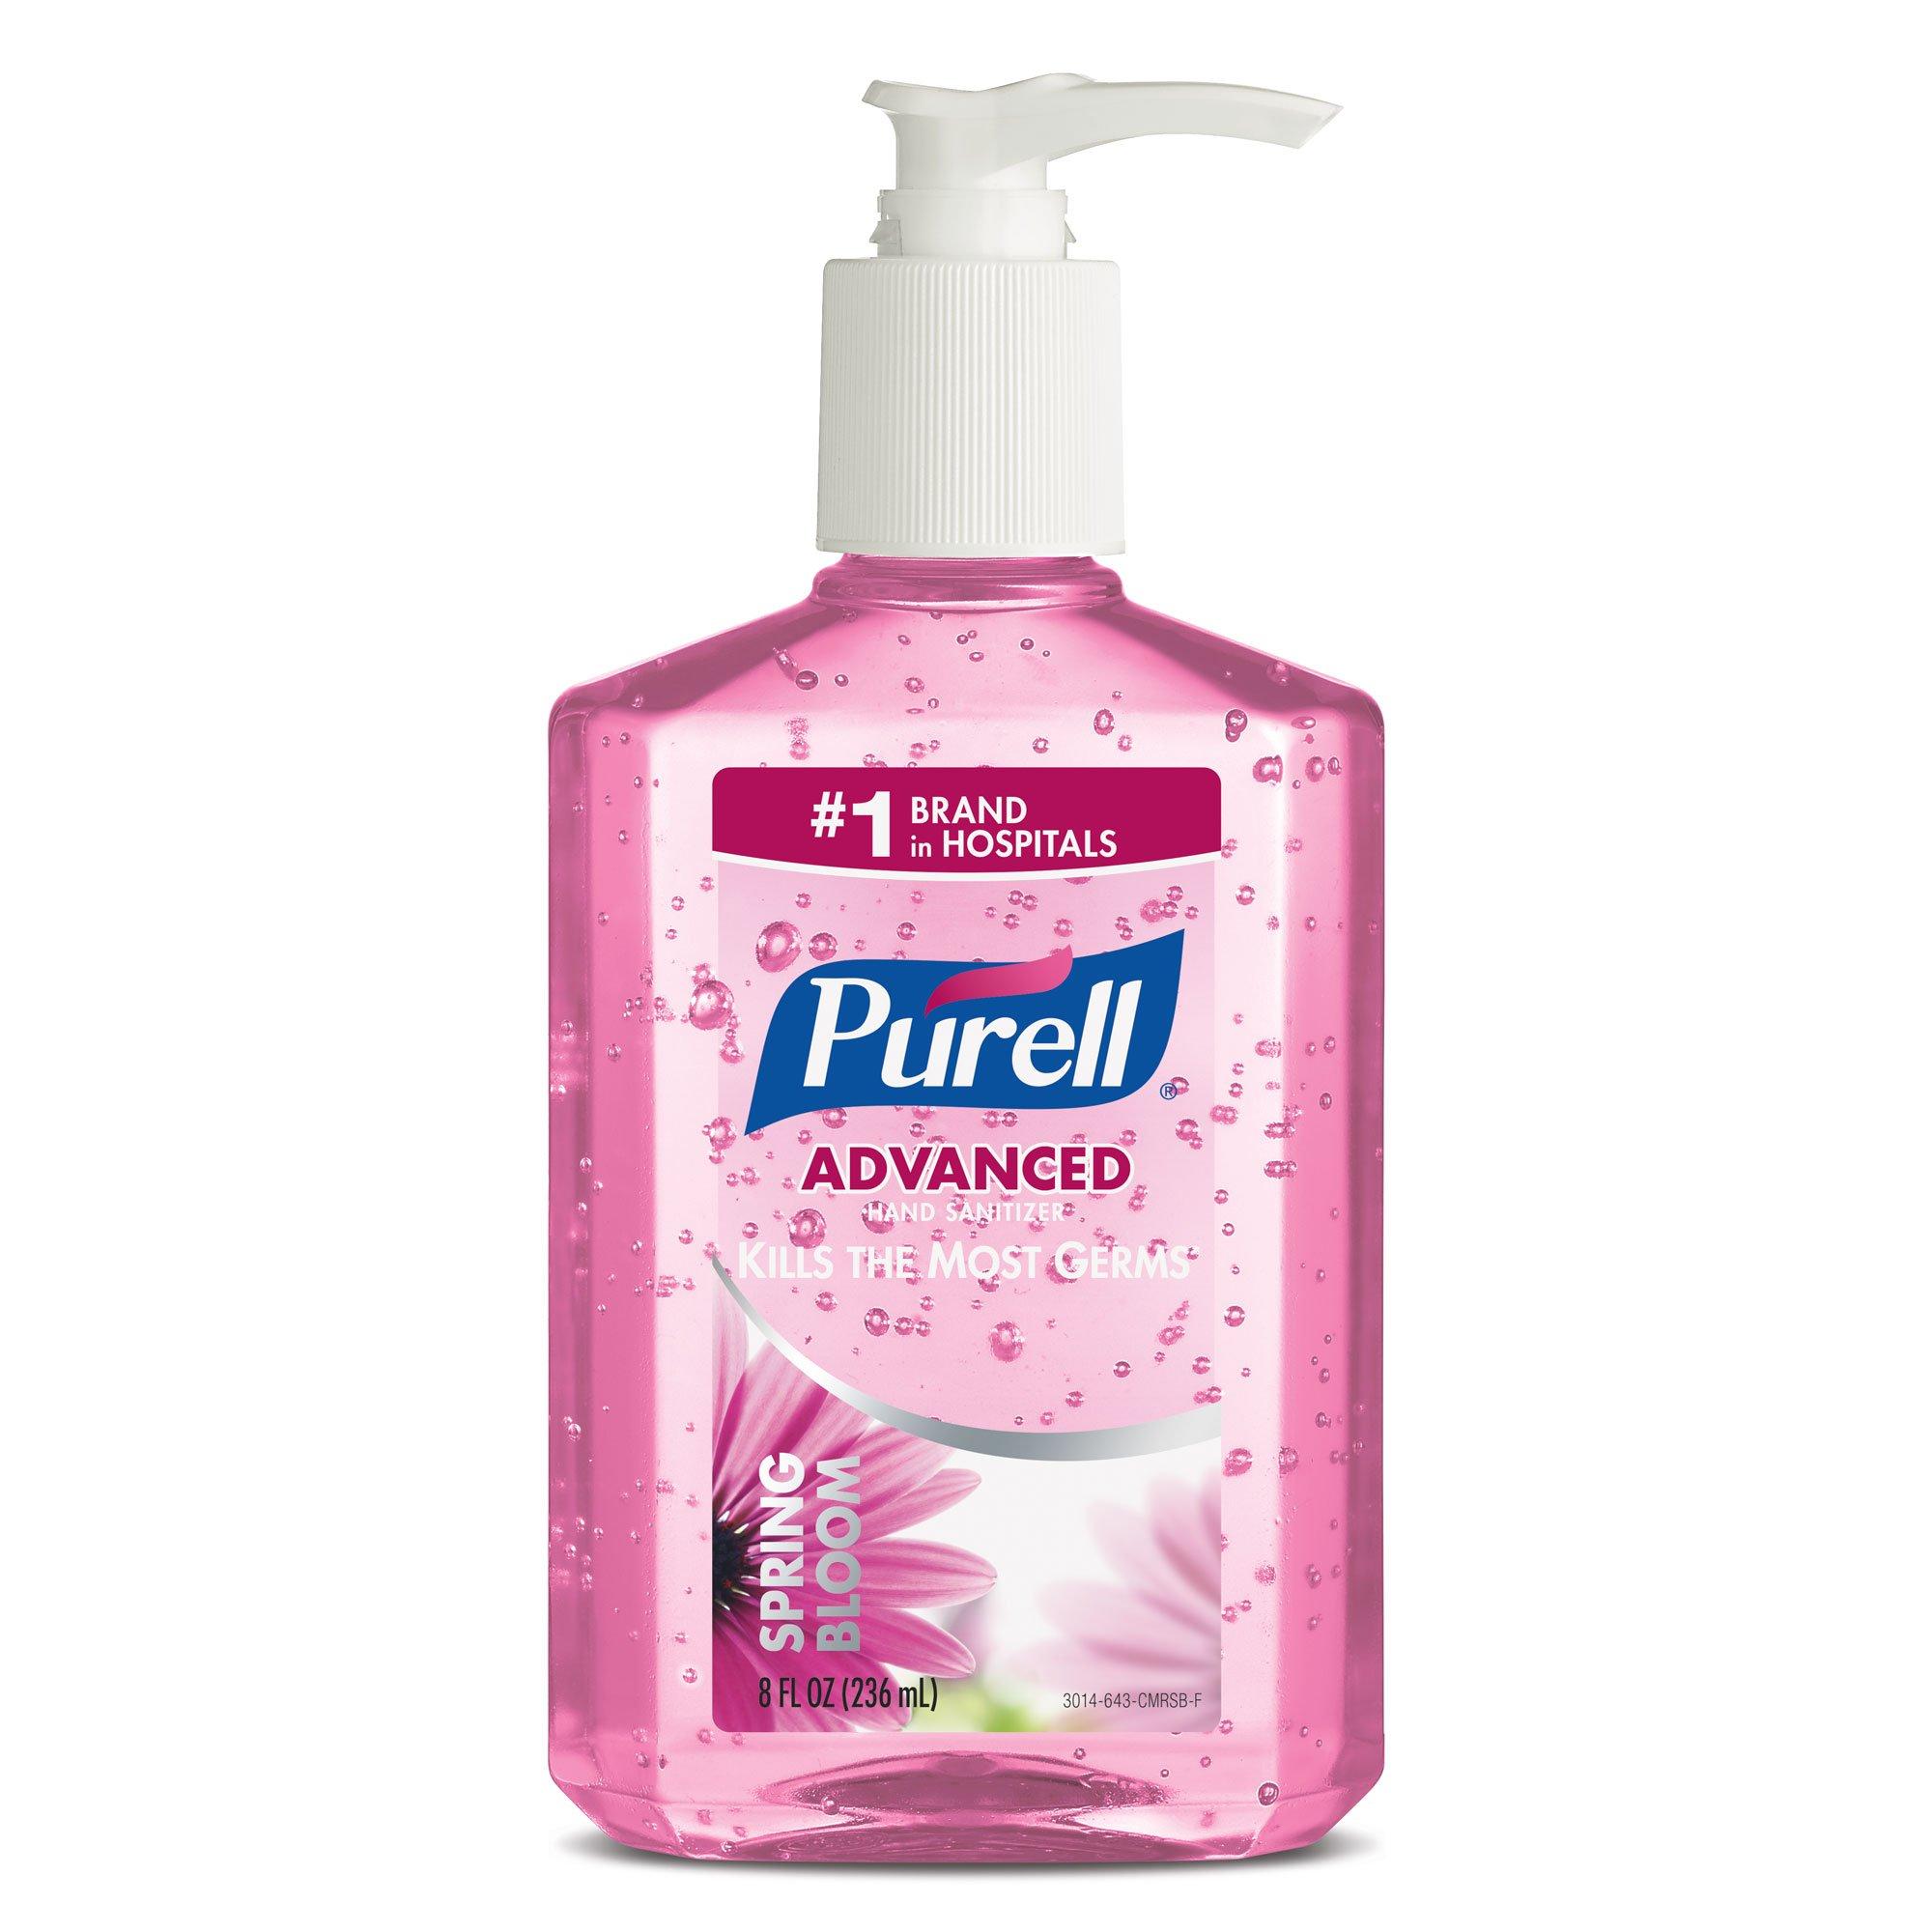 PURELL Advanced Hand Sanitizer - Spring Bloom, 8 oz. Pump Bottle, Pink (Pack of 4)